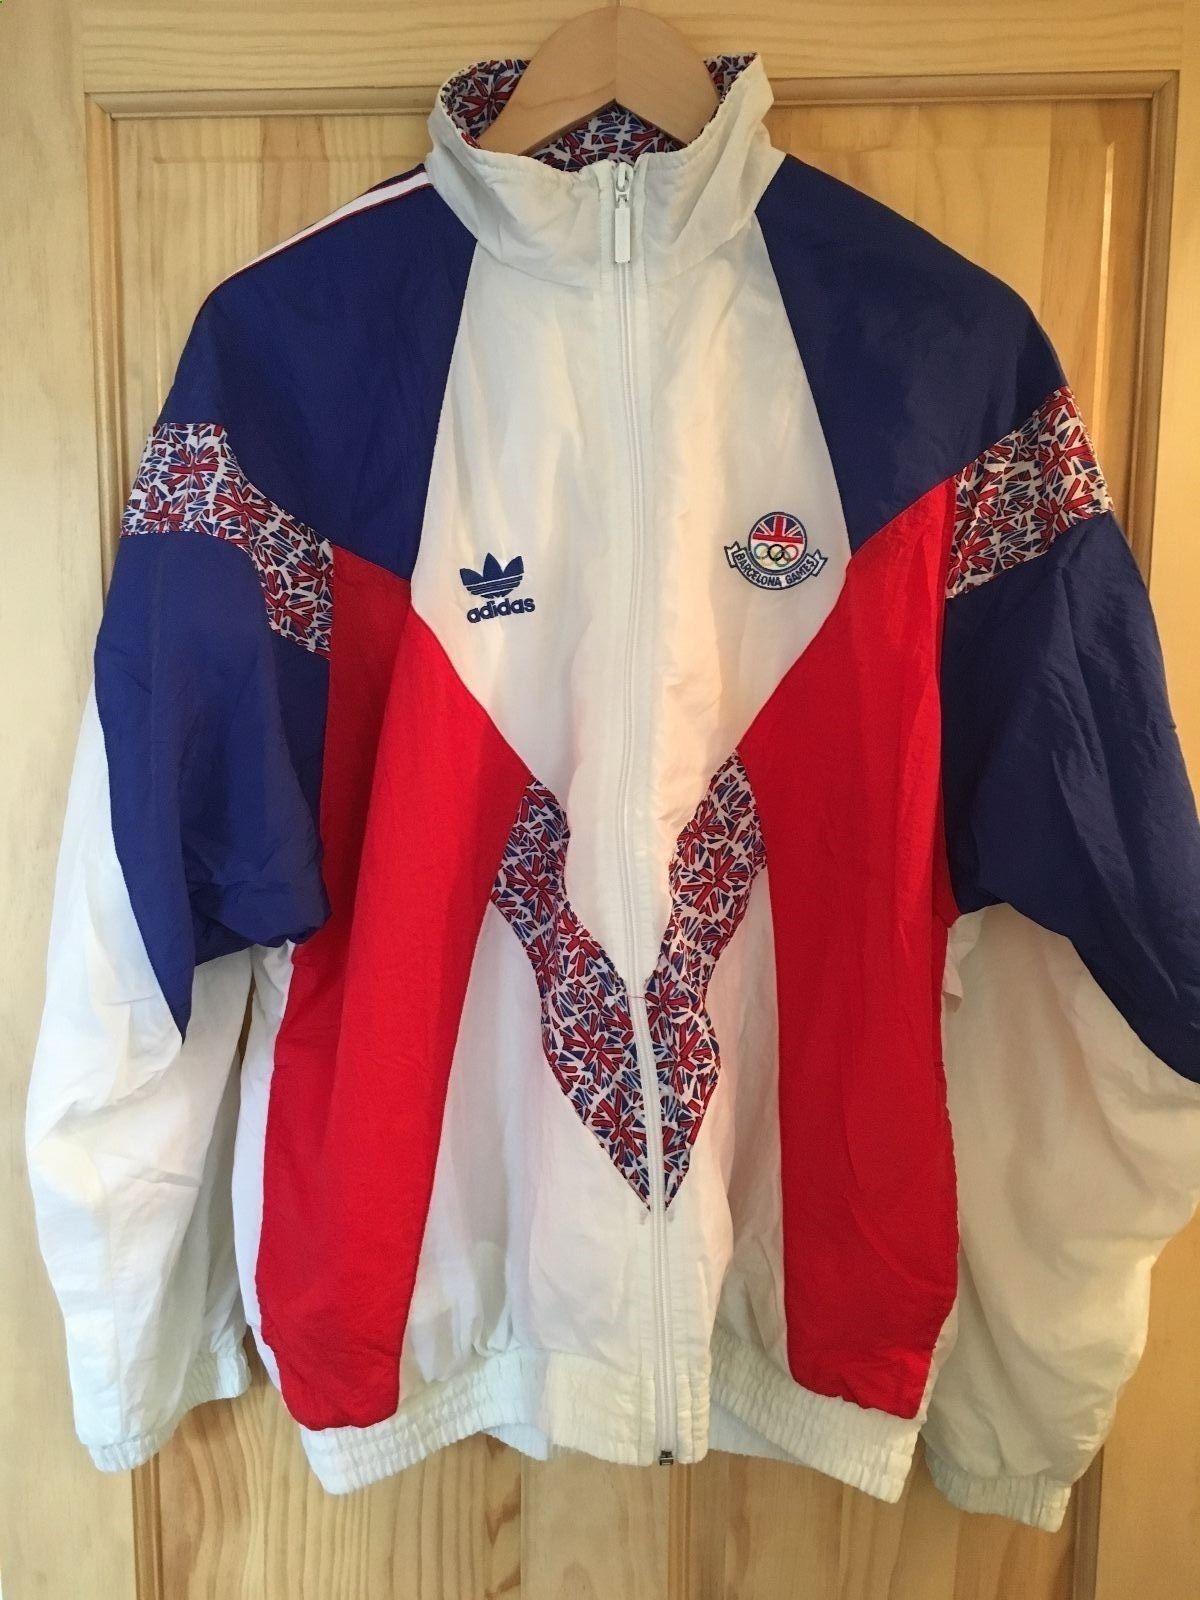 adidas 90s. Vintage ADIDAS Team GB Barcelona 92 Olympics......(Deadstock, Adidas 90s